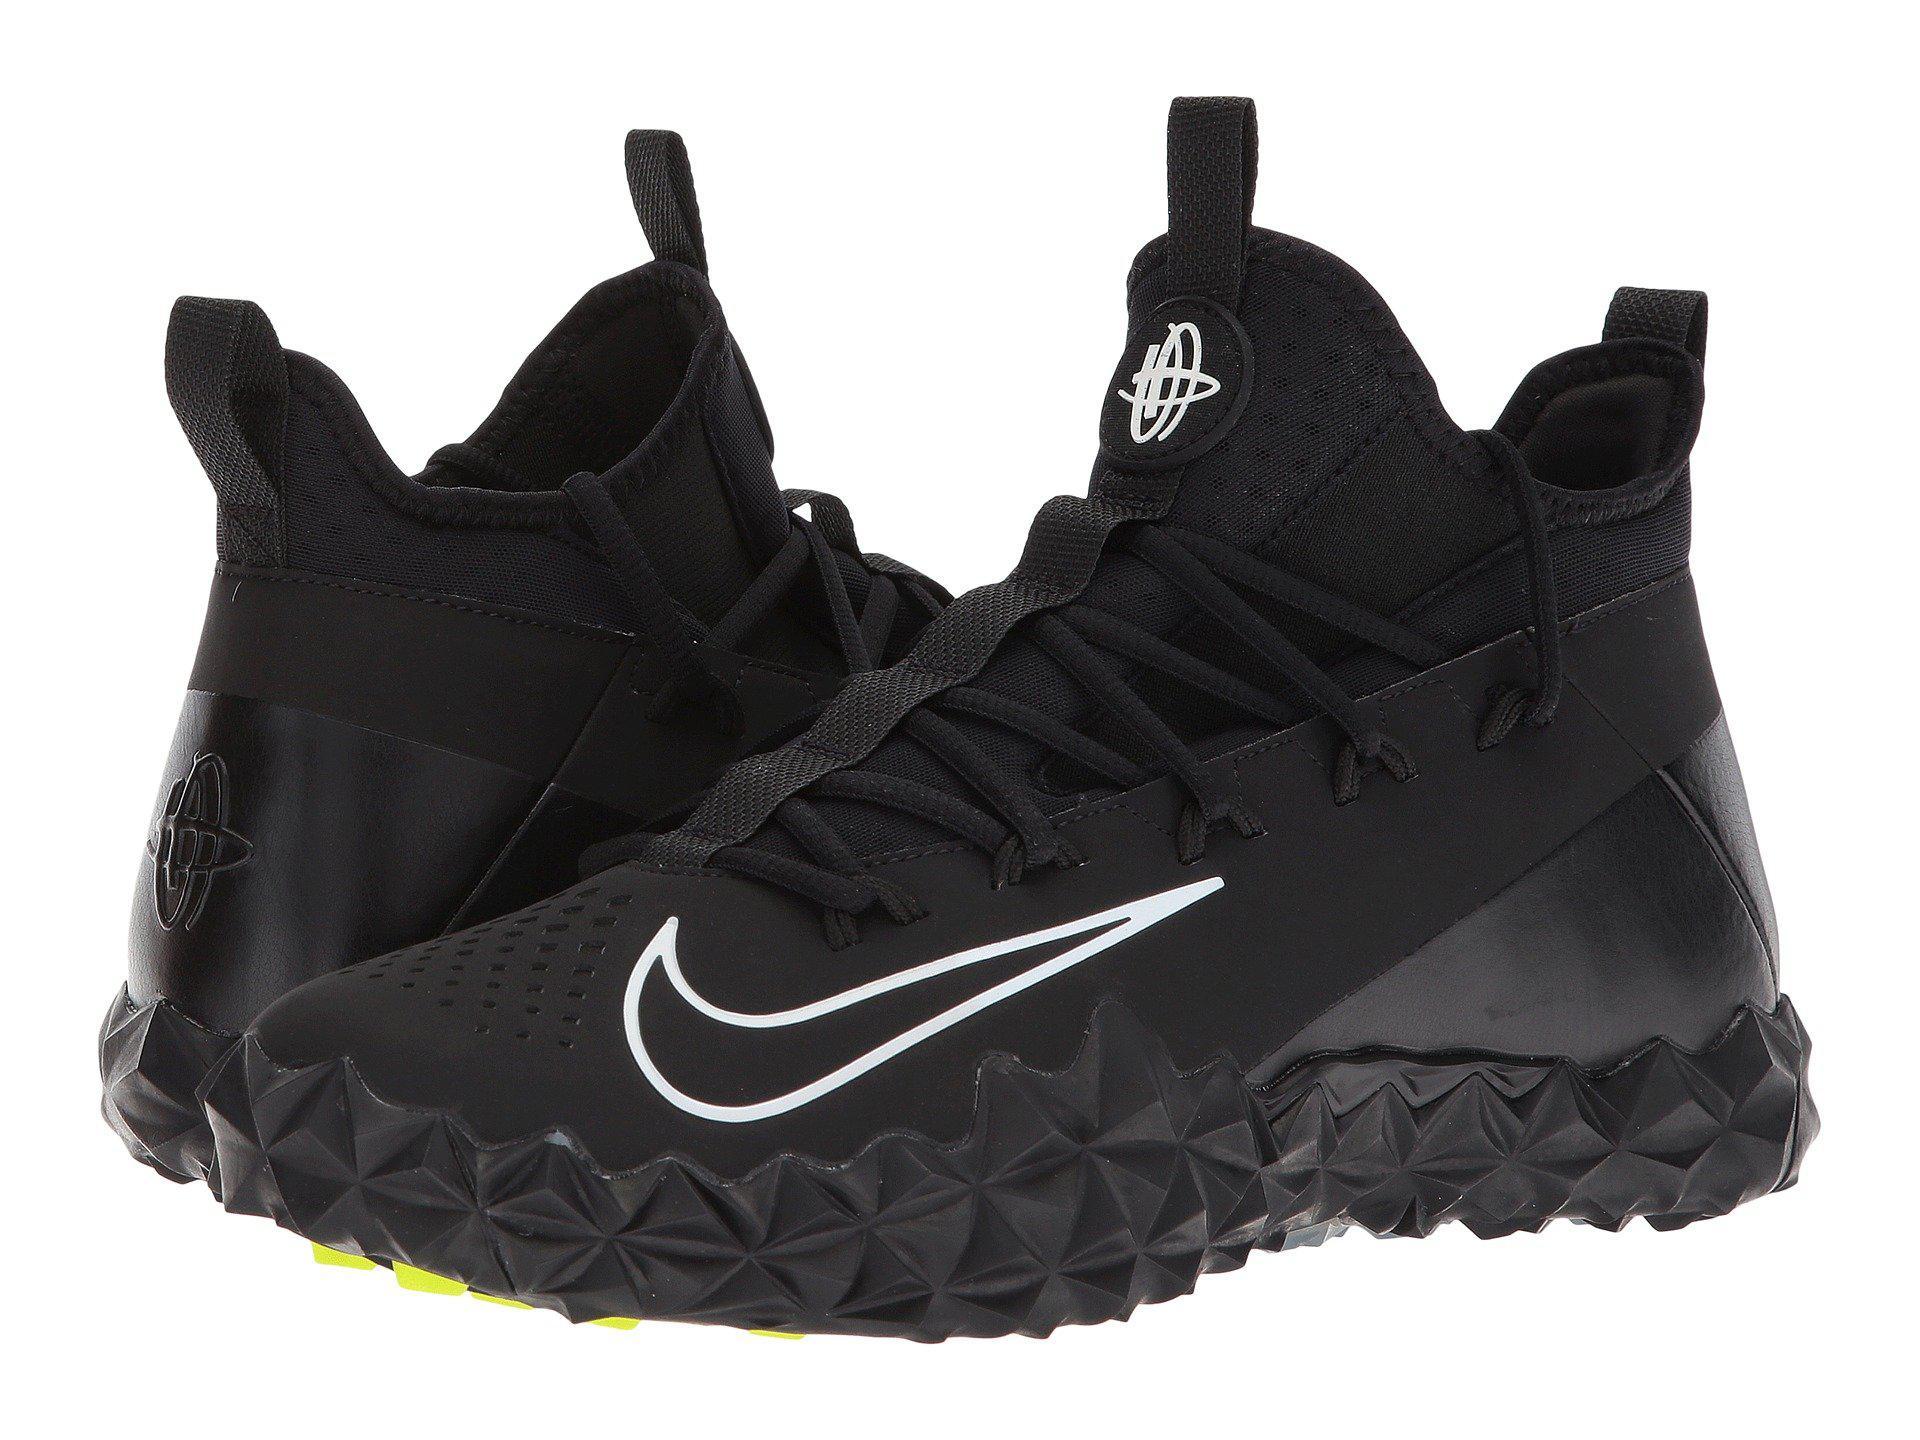 308c95ce294d Lyst - Nike Alpha Huarache 6 Elt Turf Lax in Black for Men